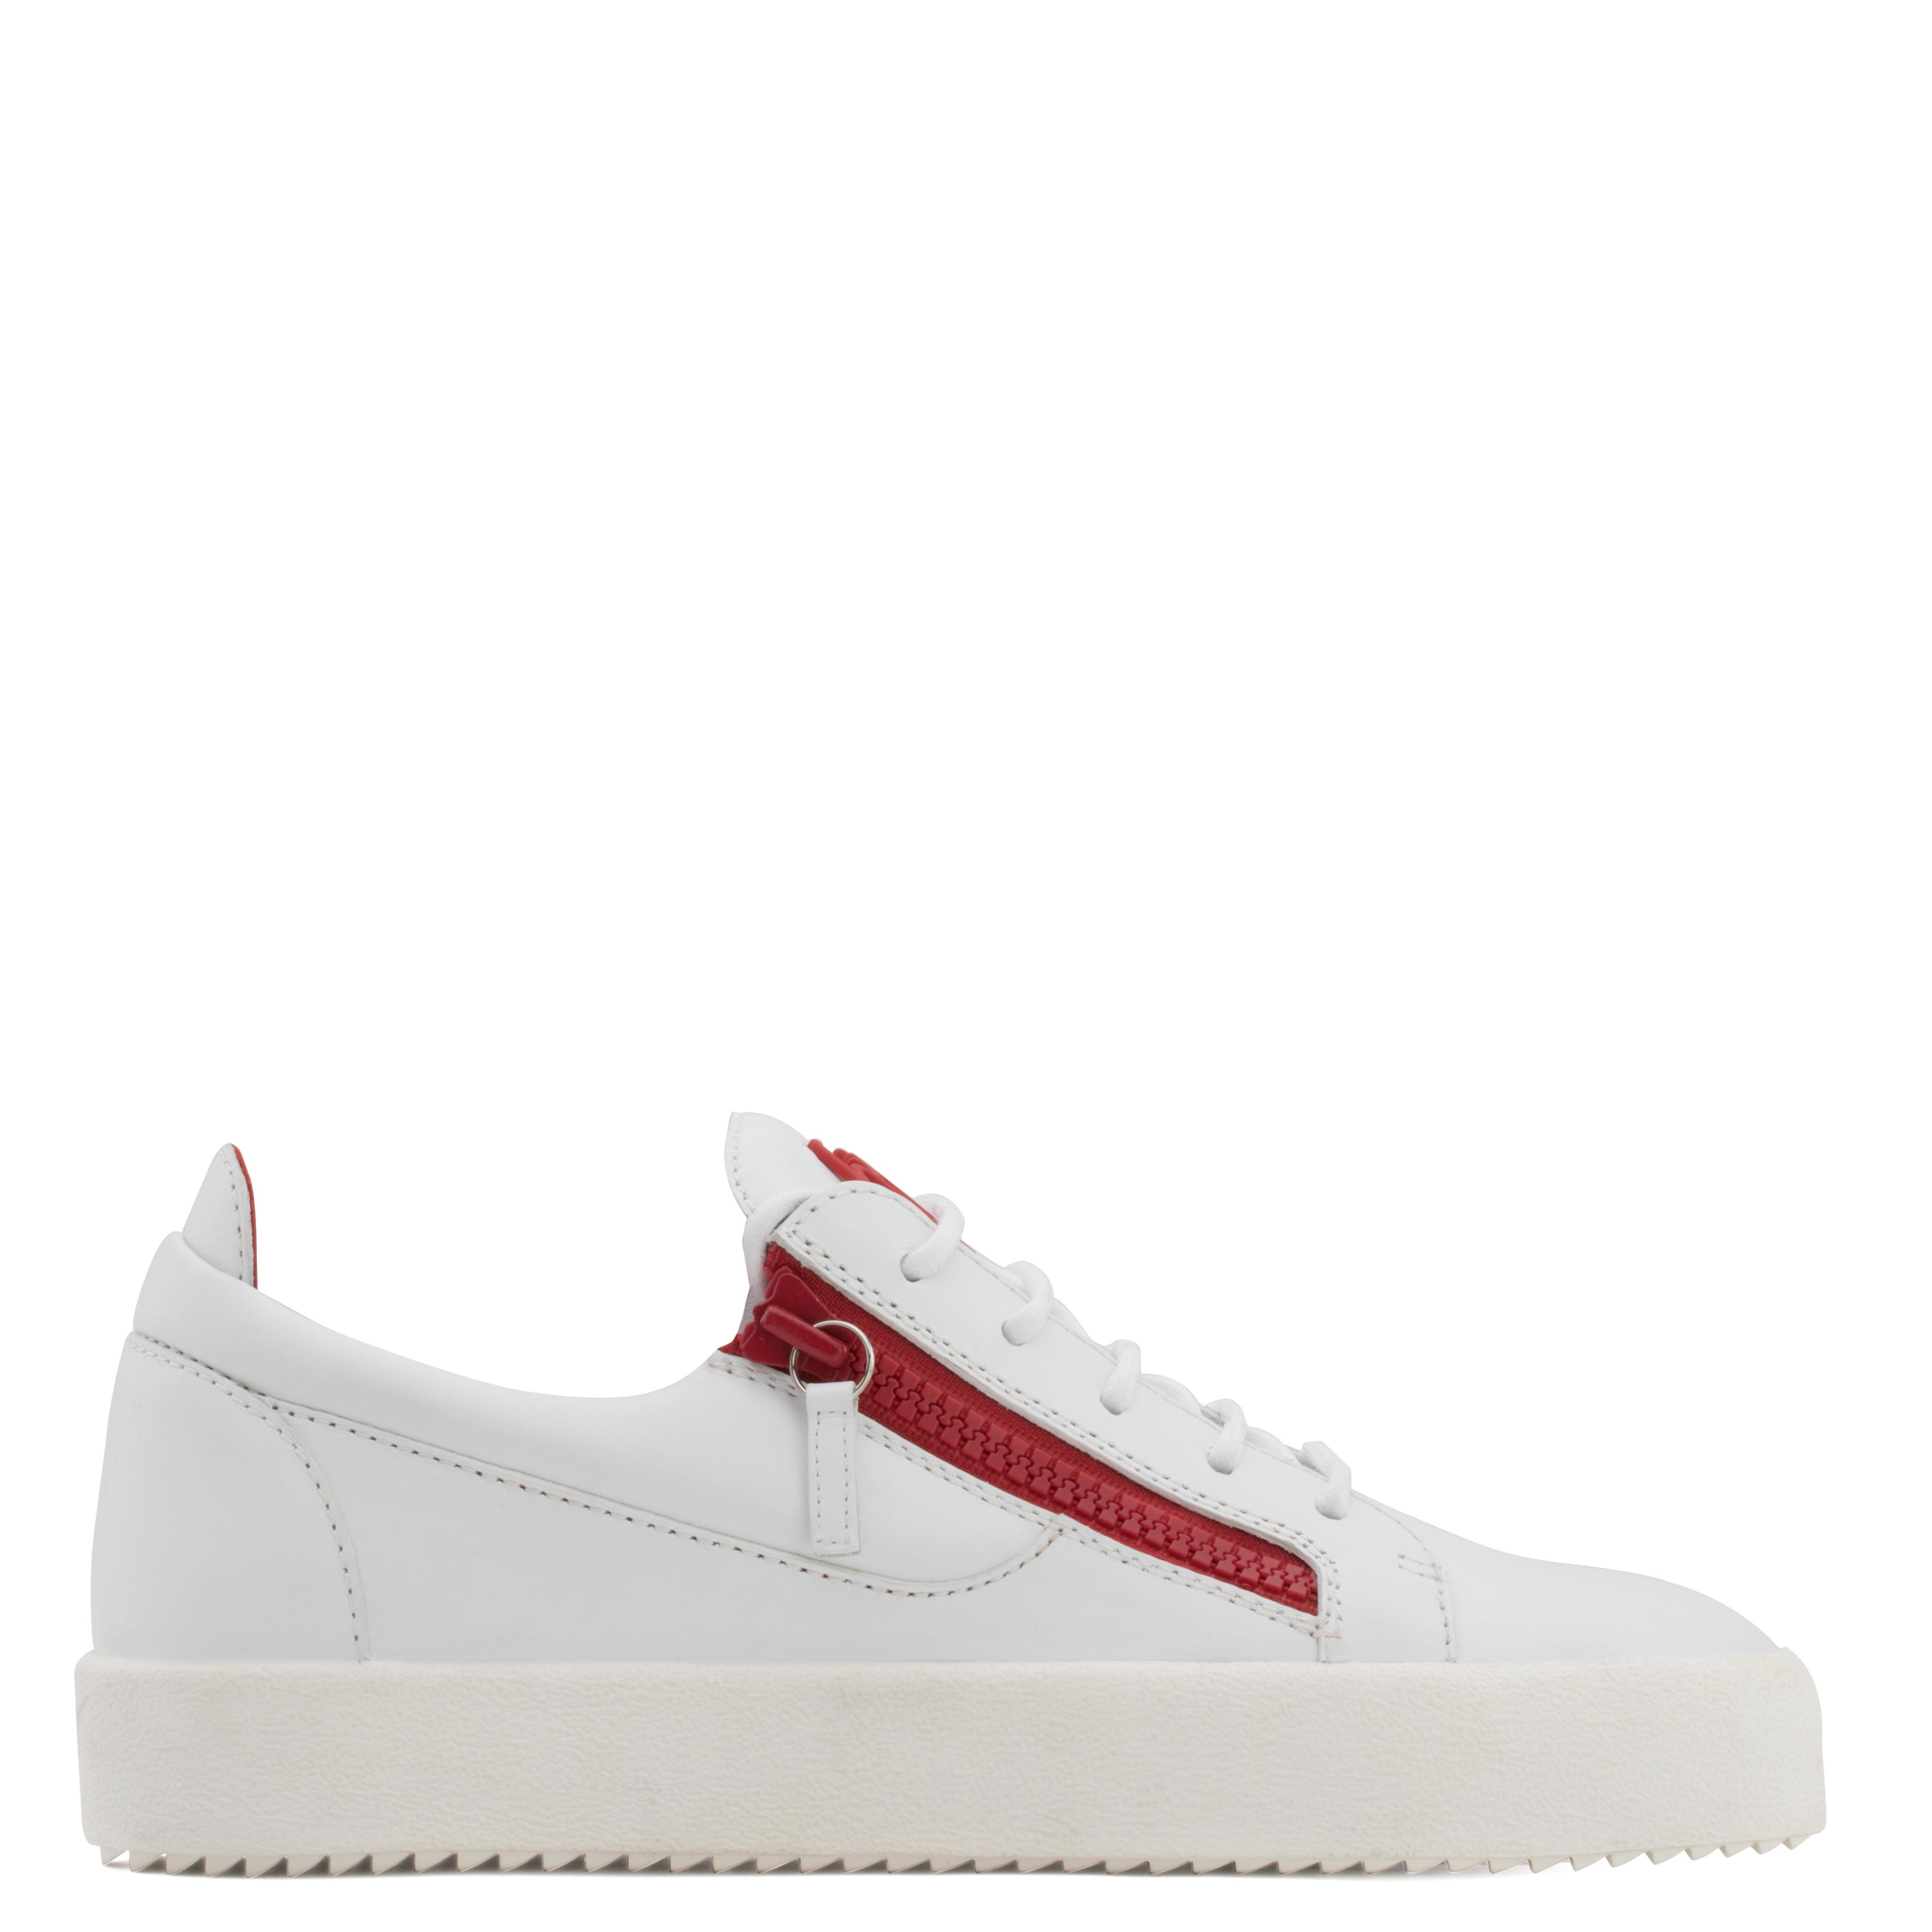 Giuseppe Zanotti Calfskin leather low-top sneaker with red zips FRANKIE jv4Me5e